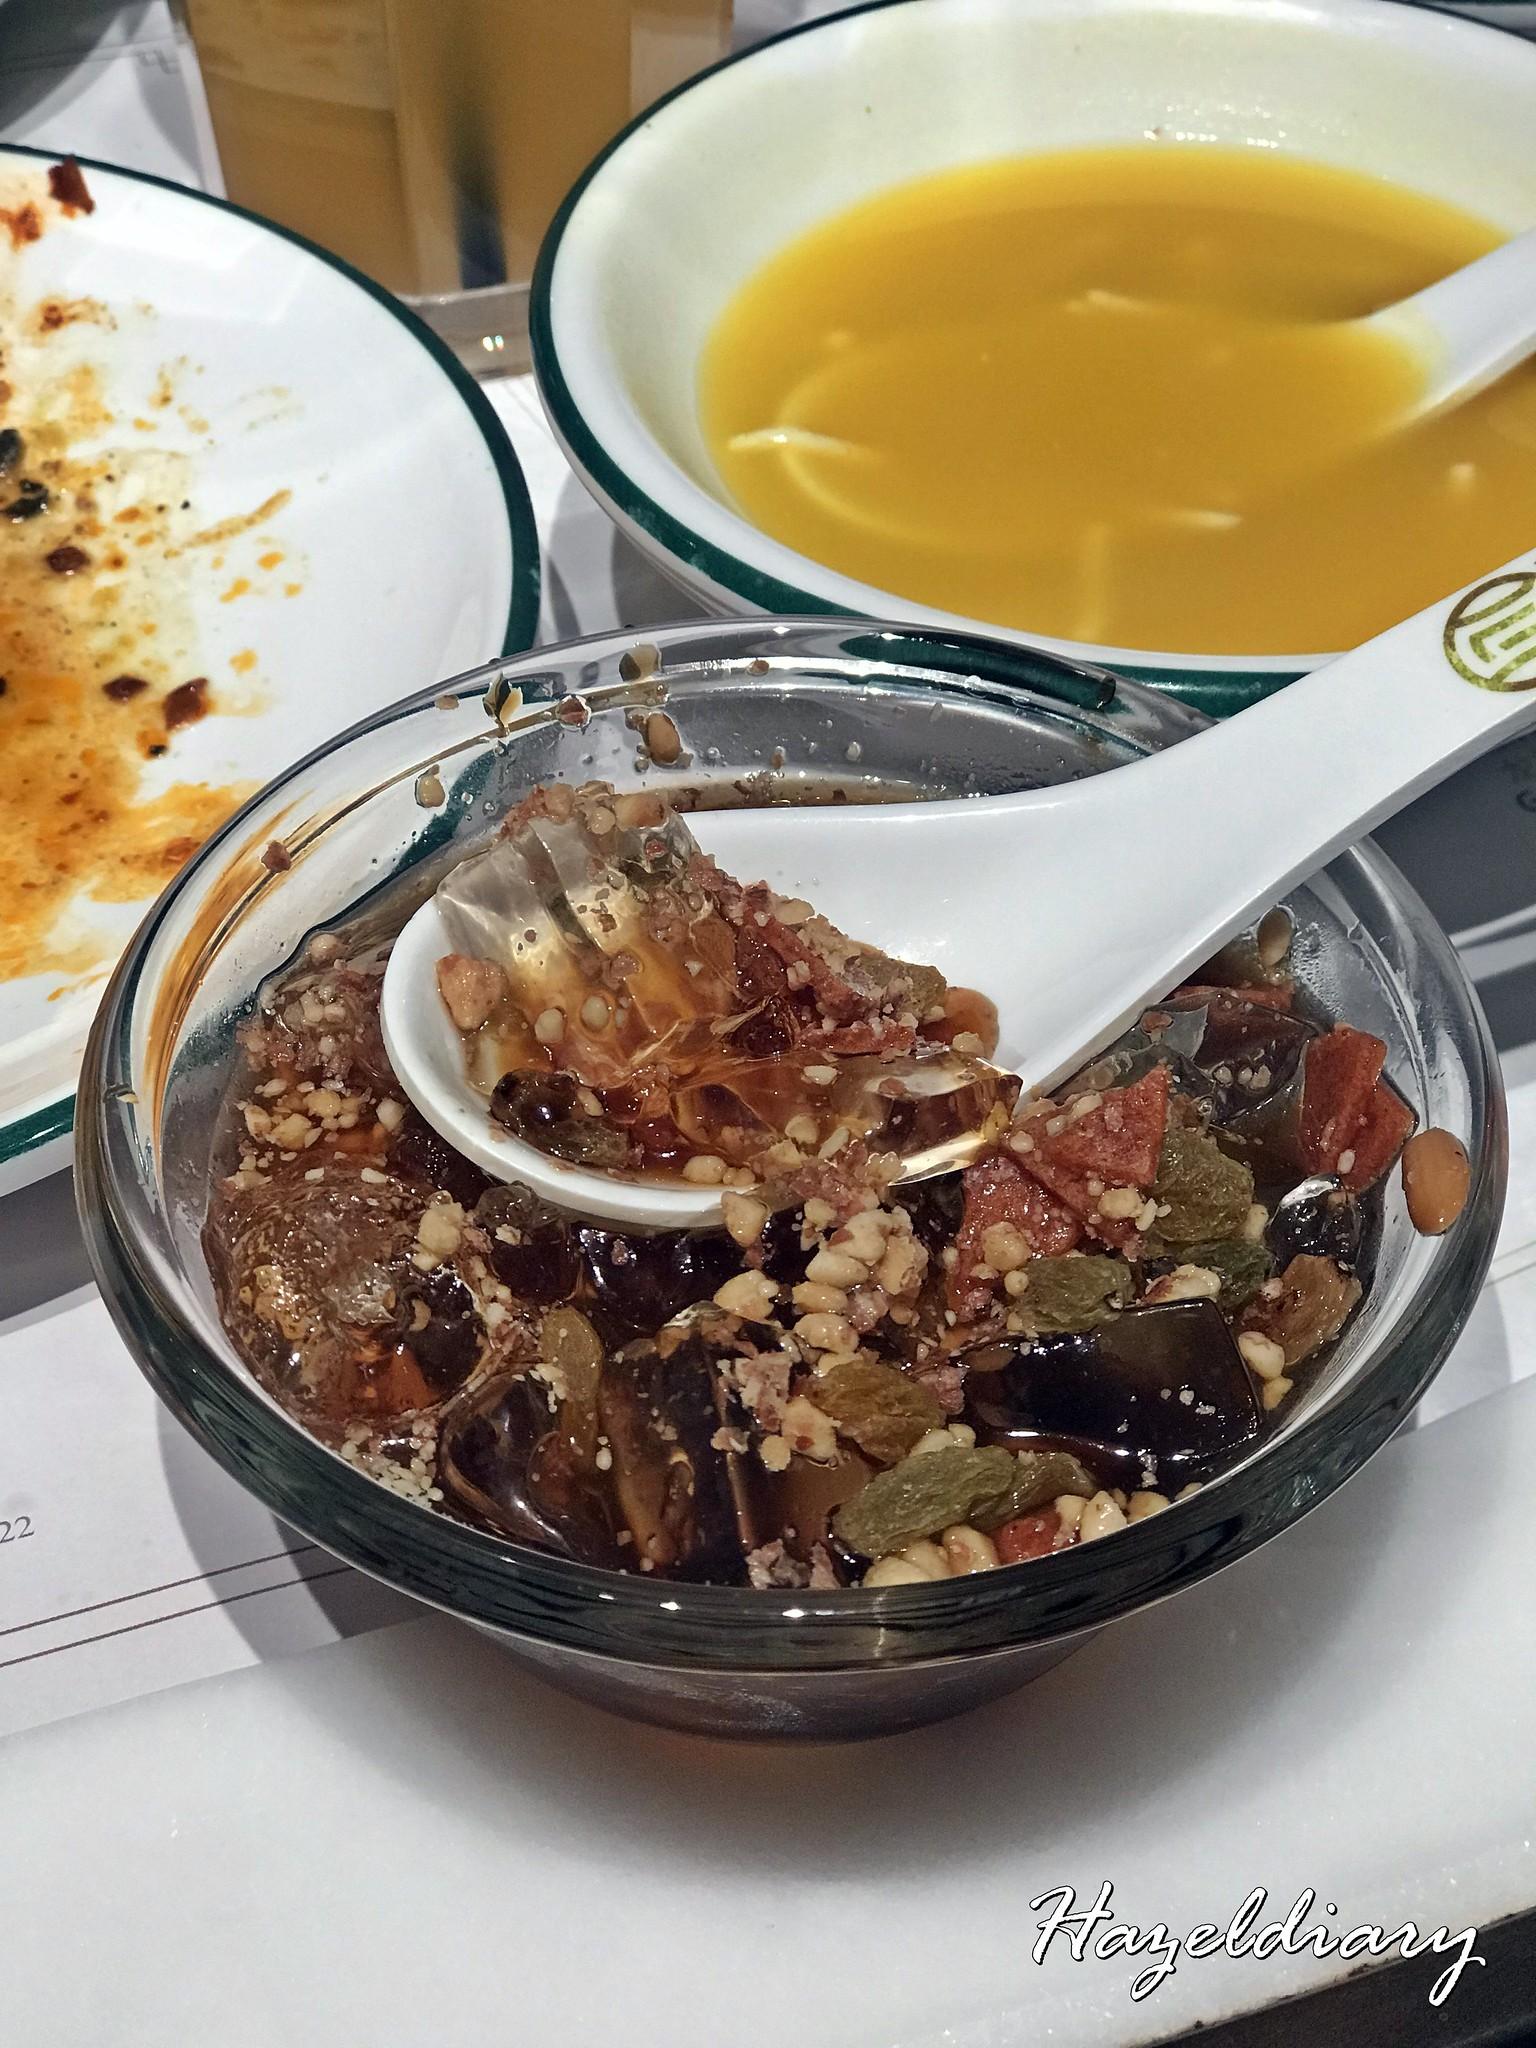 Tong Xin Ru Yi Traditional Hotpot-Traditional Jelly